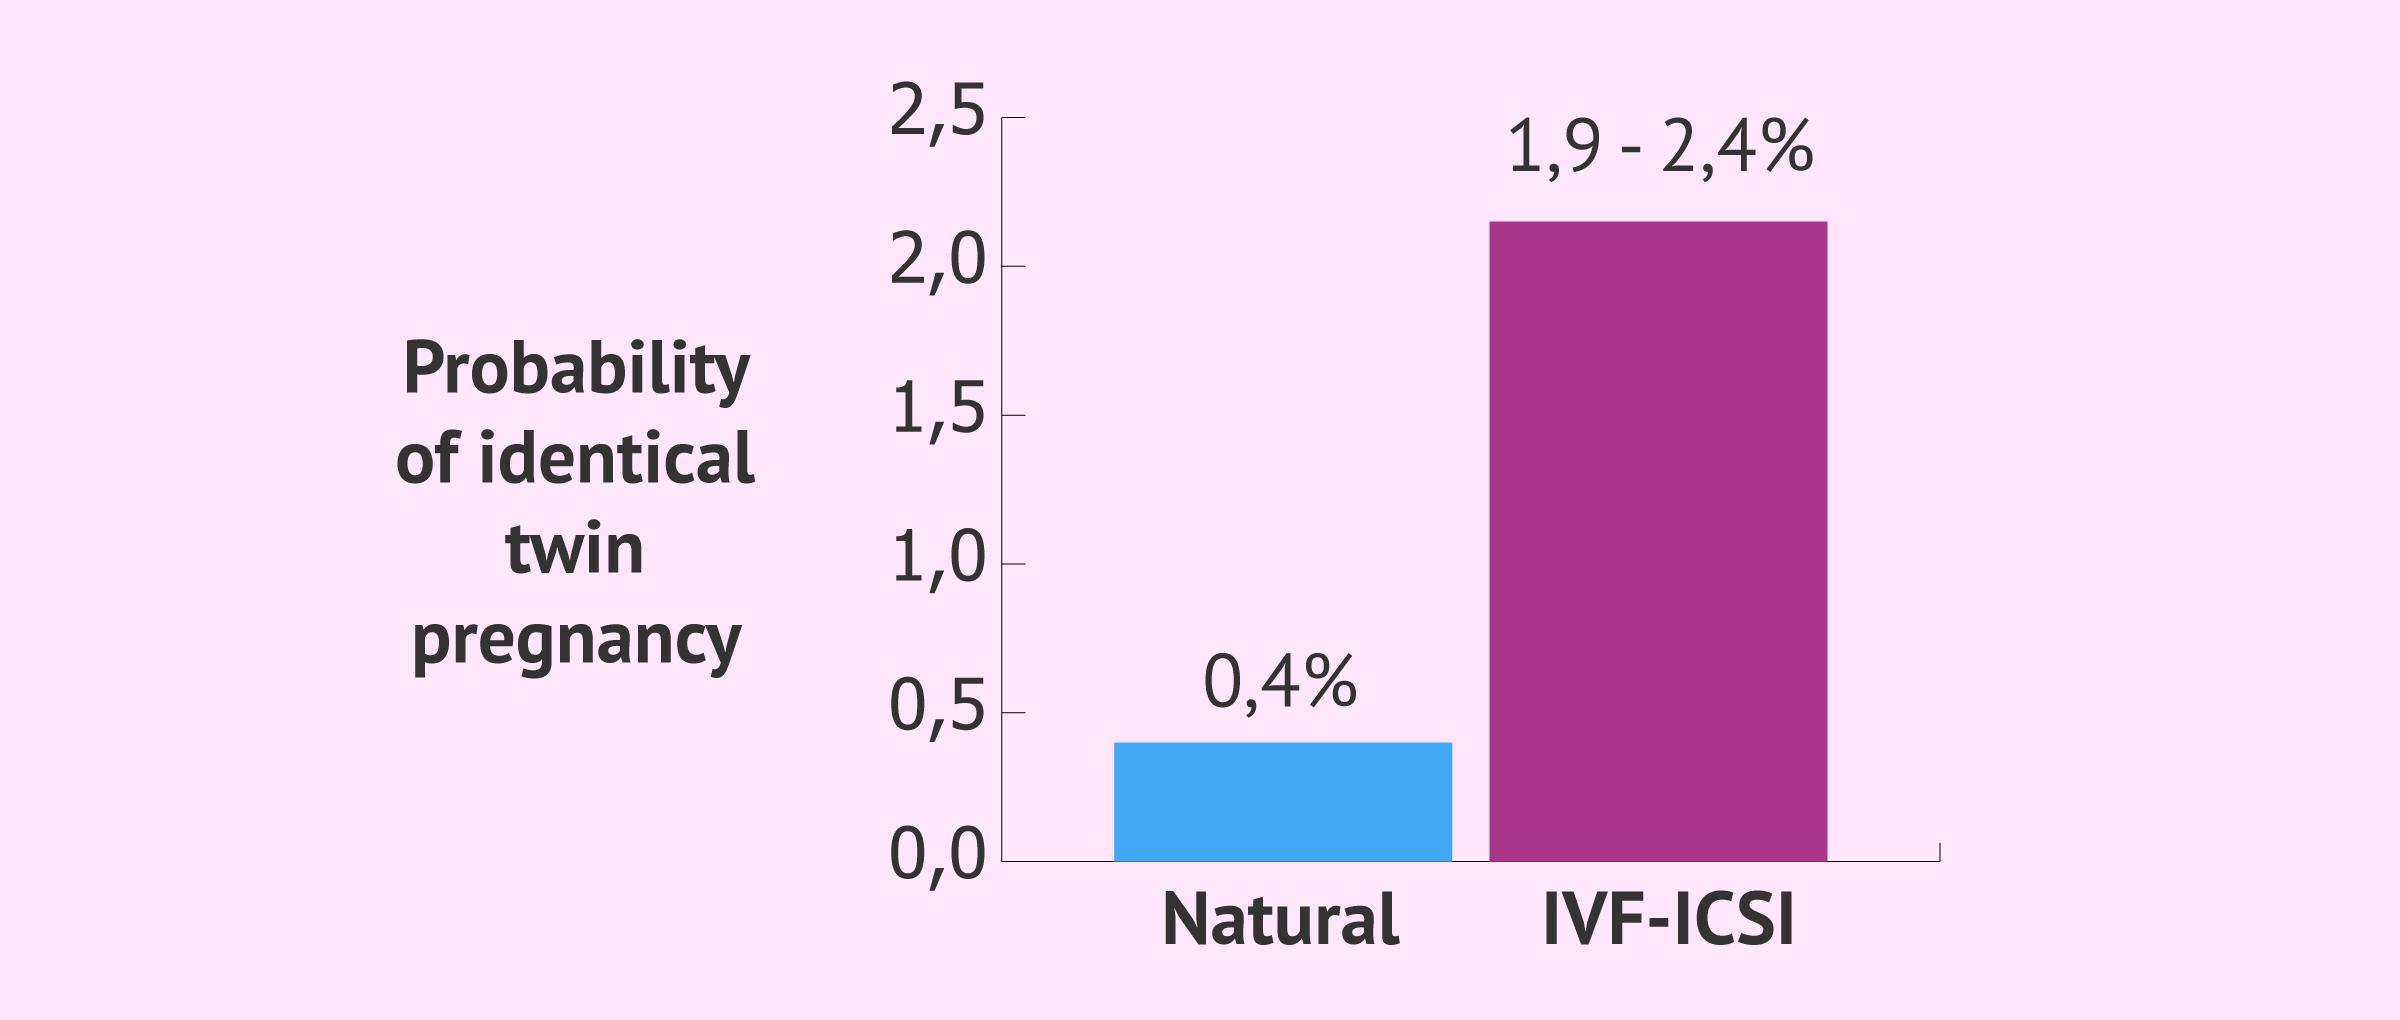 Probability of identical twins by in vitro fertilisation